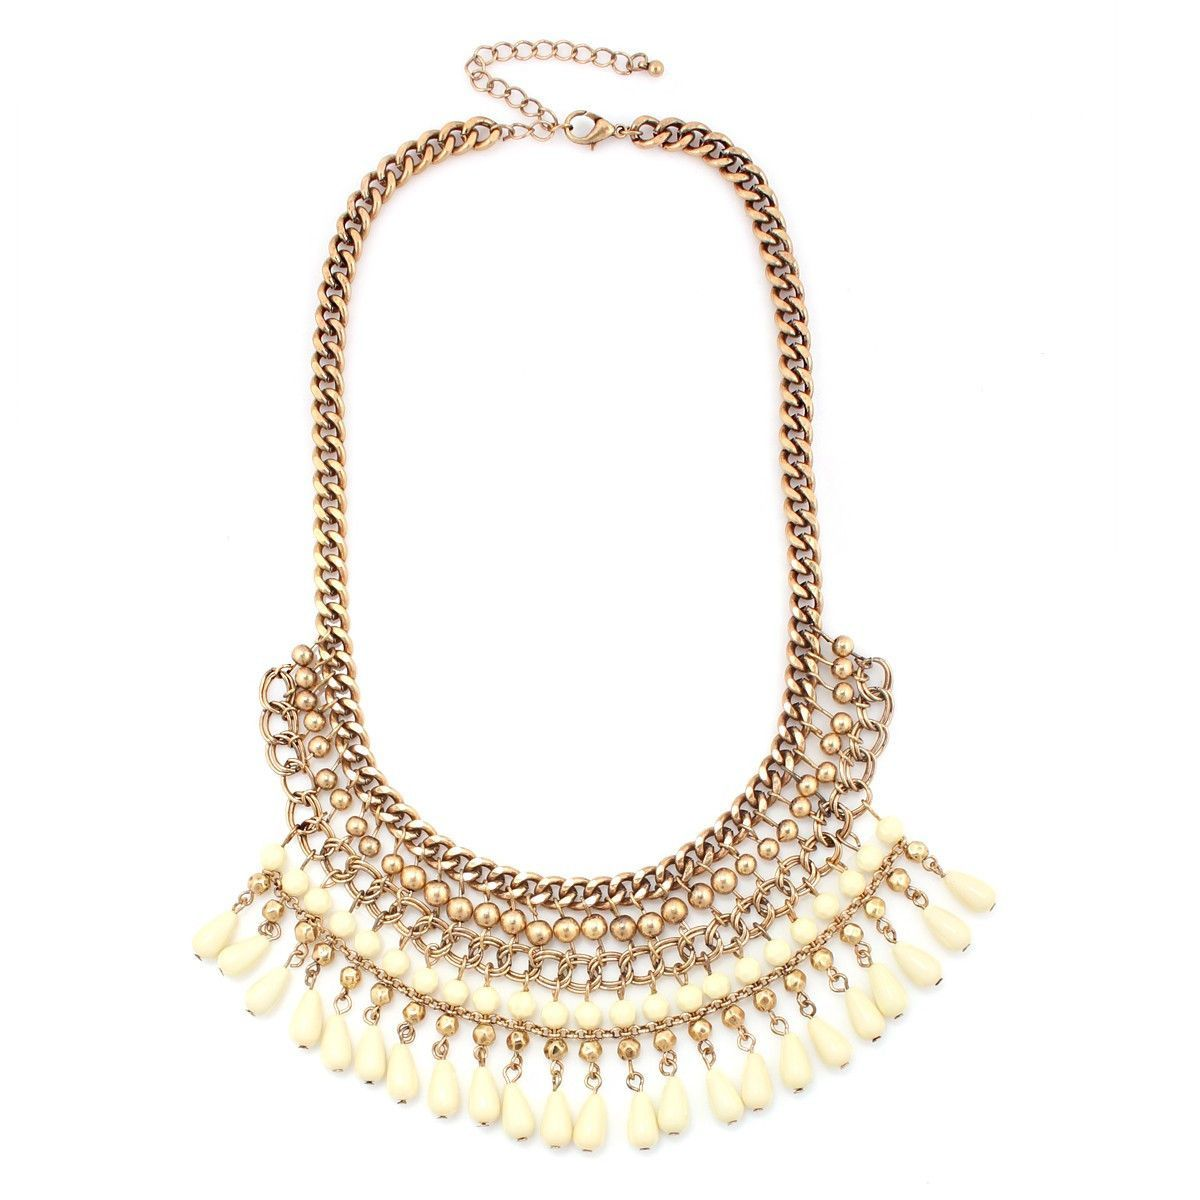 Gold-Tone Metal Creaml Ethnic Cleopatra Necklace